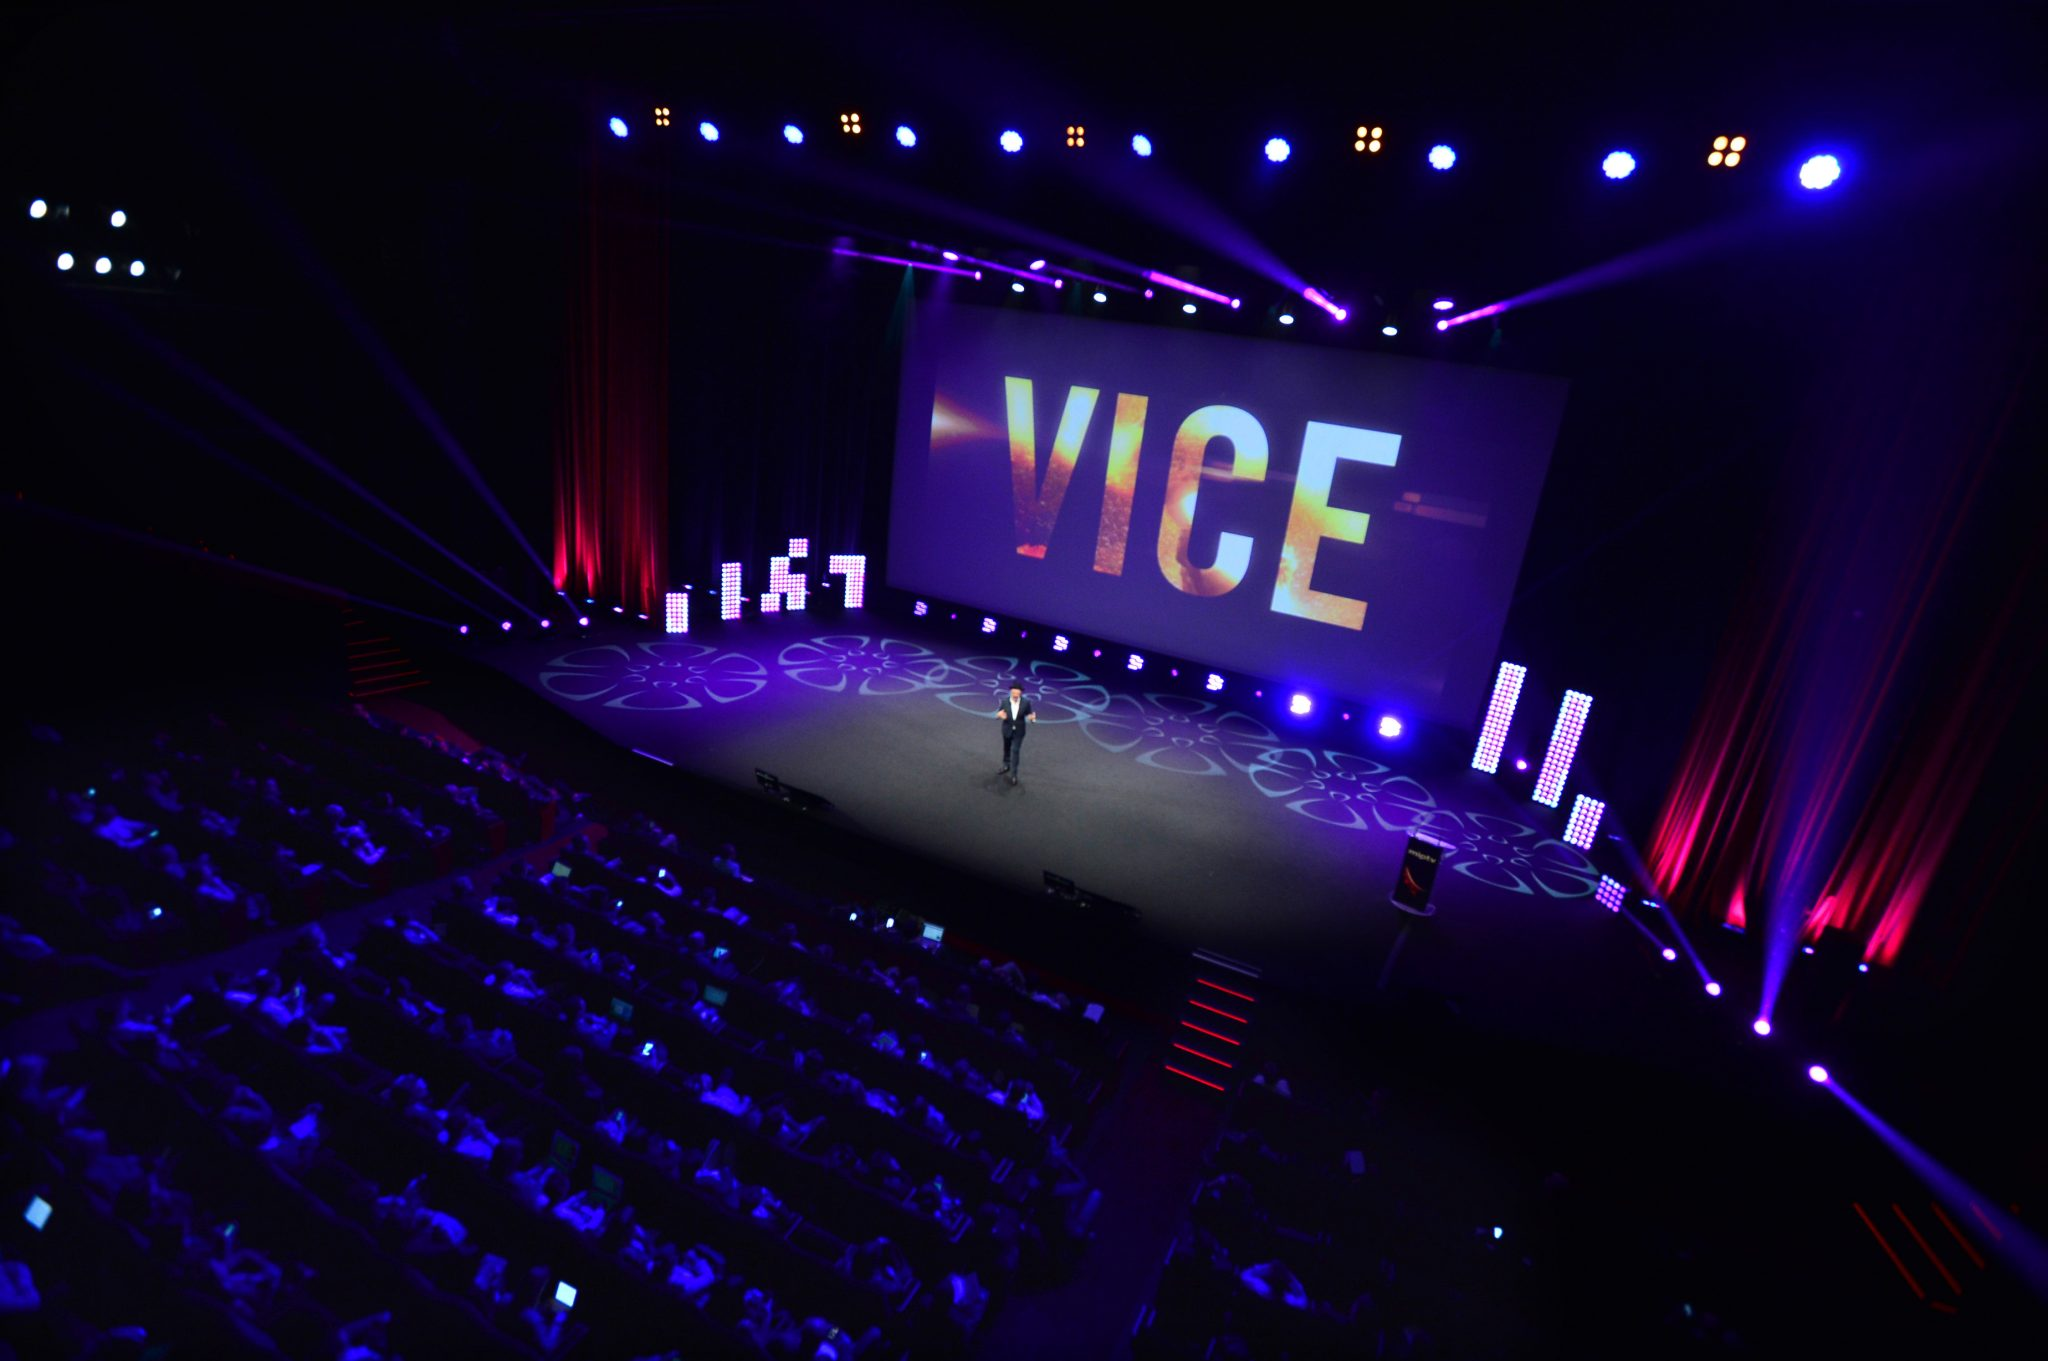 MIPTV 2015 - CONFERENCES - MIP DIGITAL SCREENING - VICE - EDDY MORETTI / VICE MEDIA